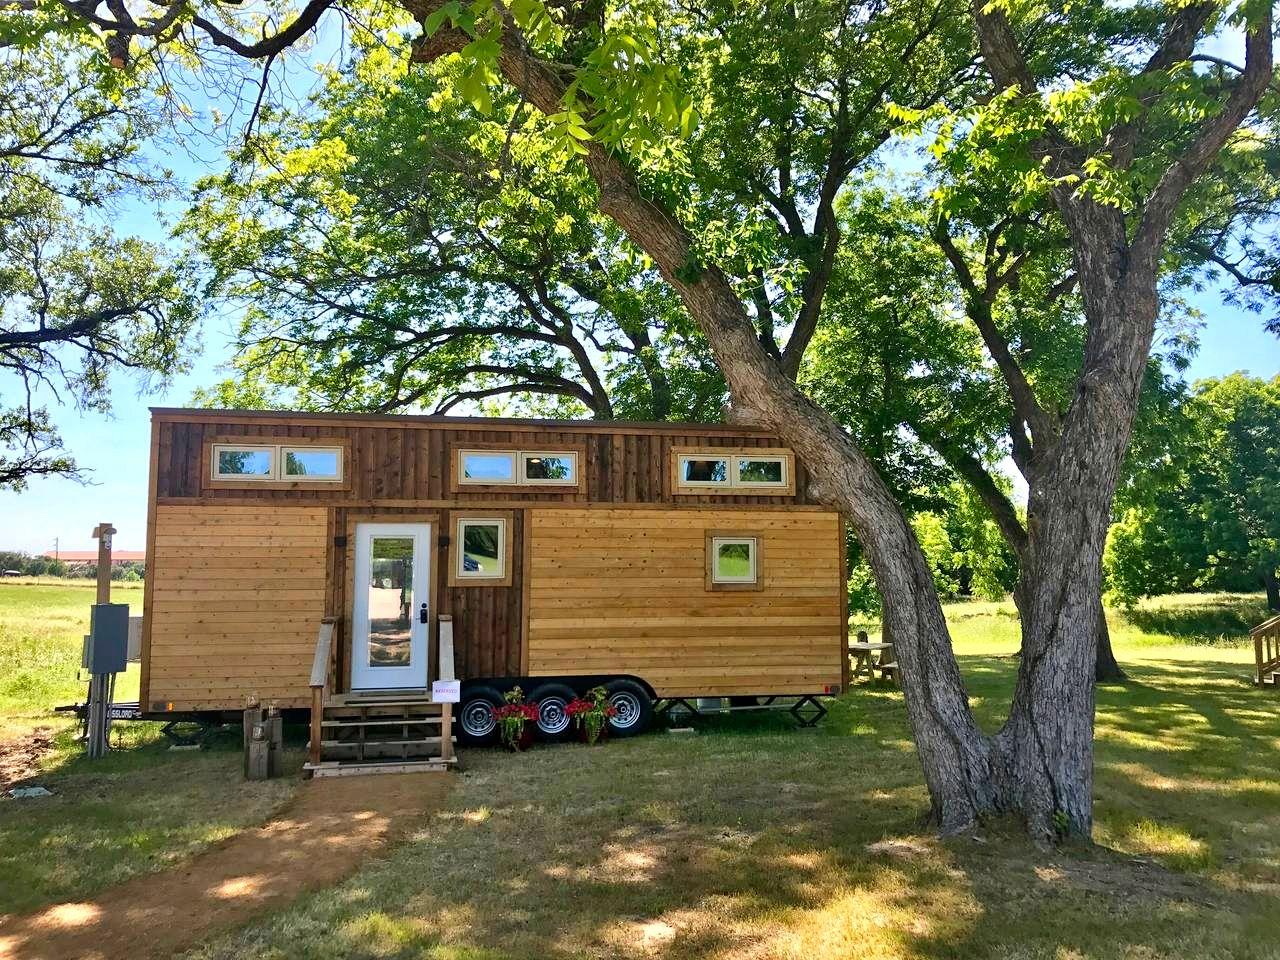 Beautiful Modern Tiny House for a Weekend Getaway in Waco, Texas